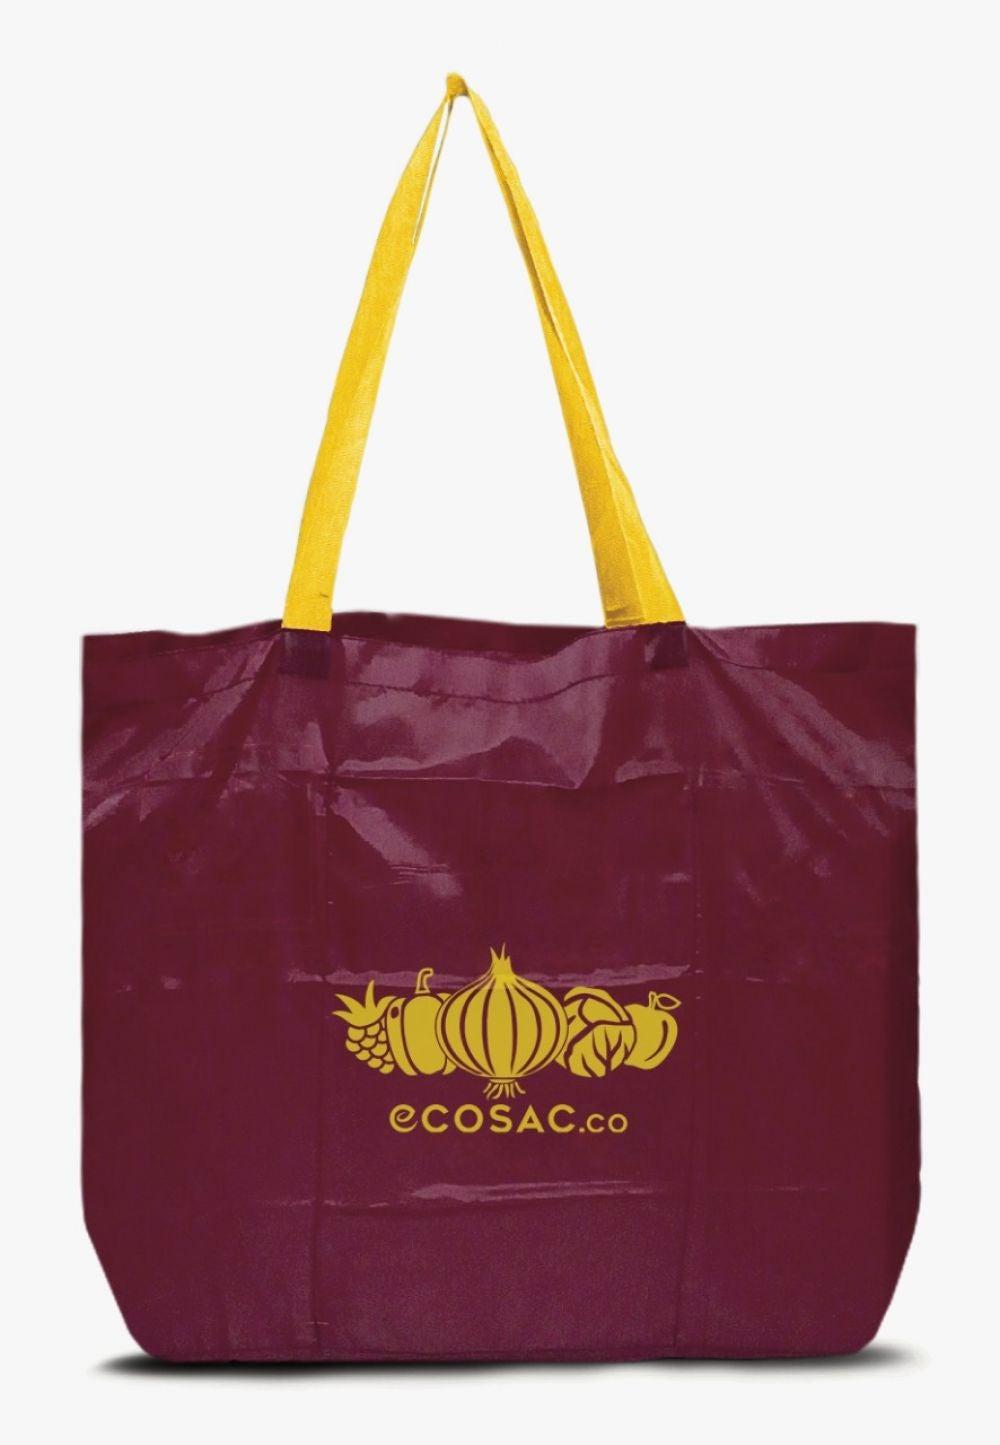 Ecosac